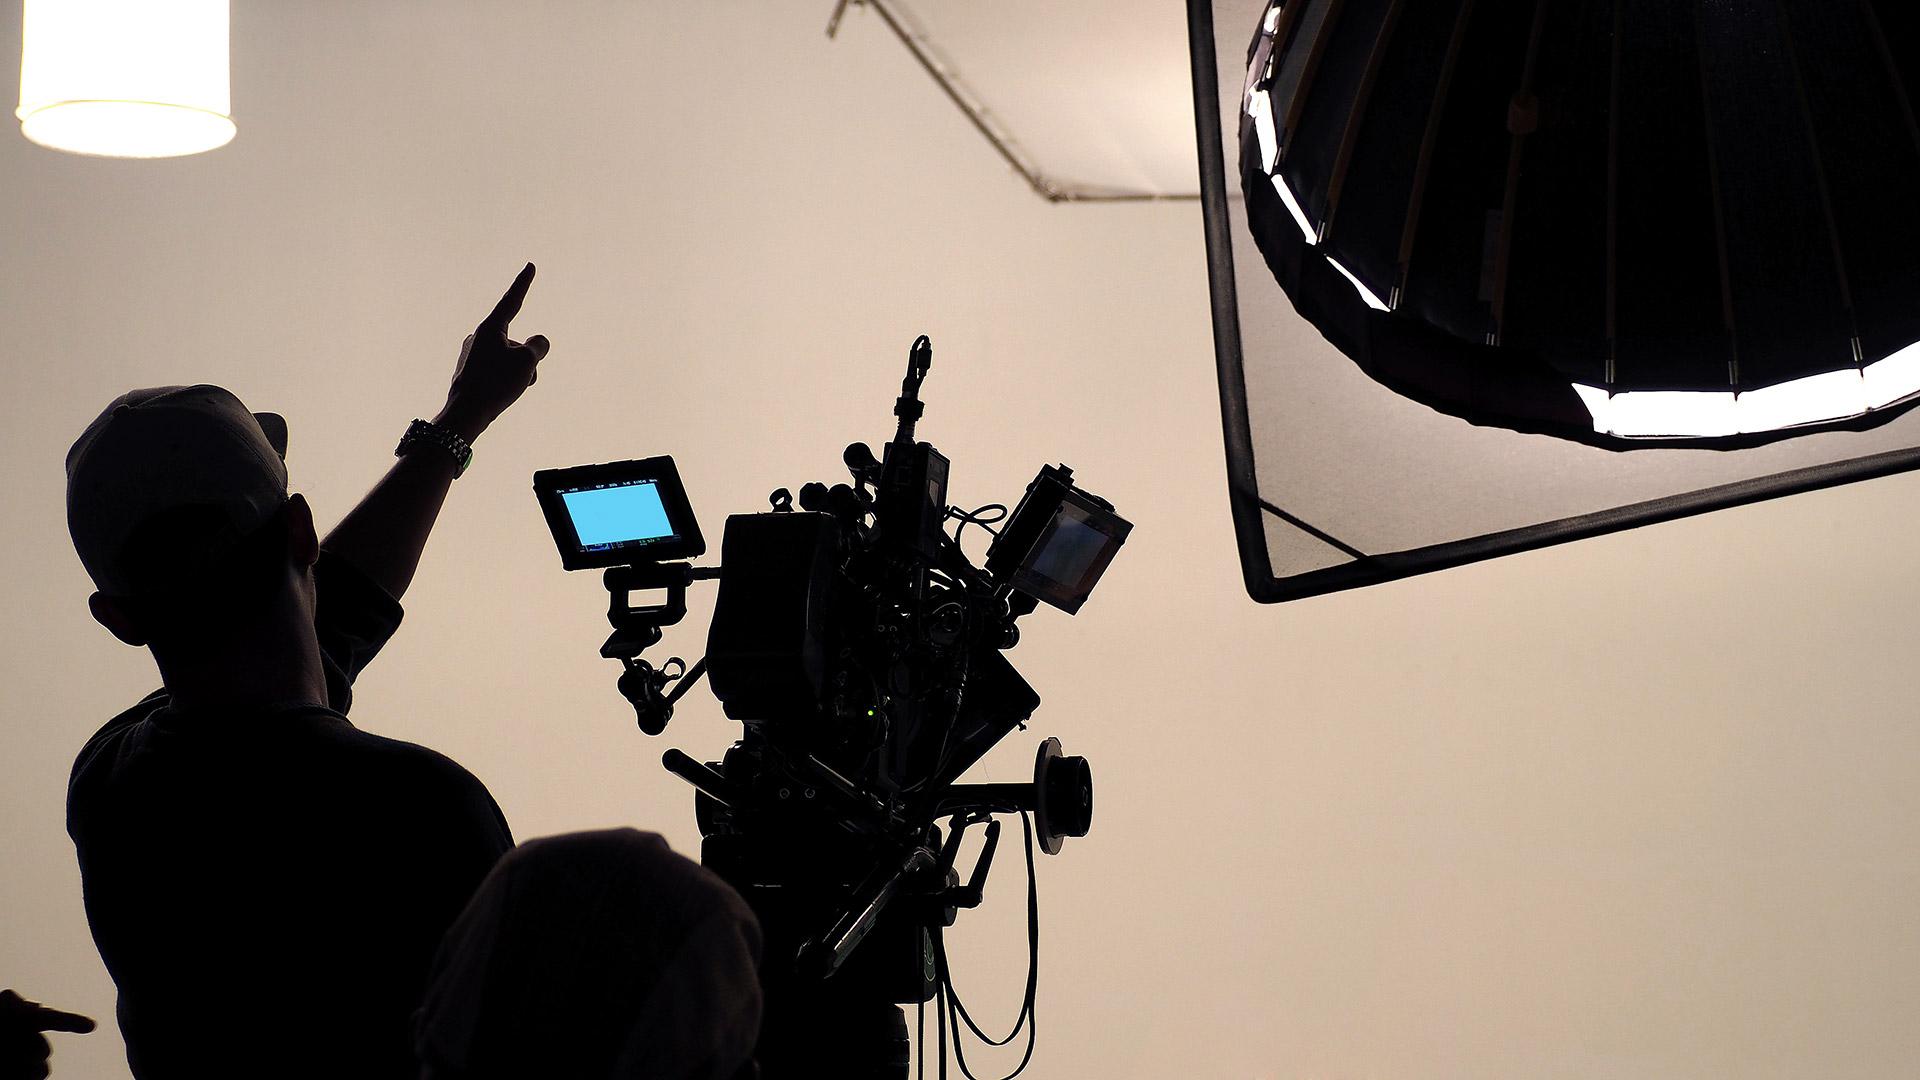 francesco russo-animado film-produzioni audiovisive-puglia